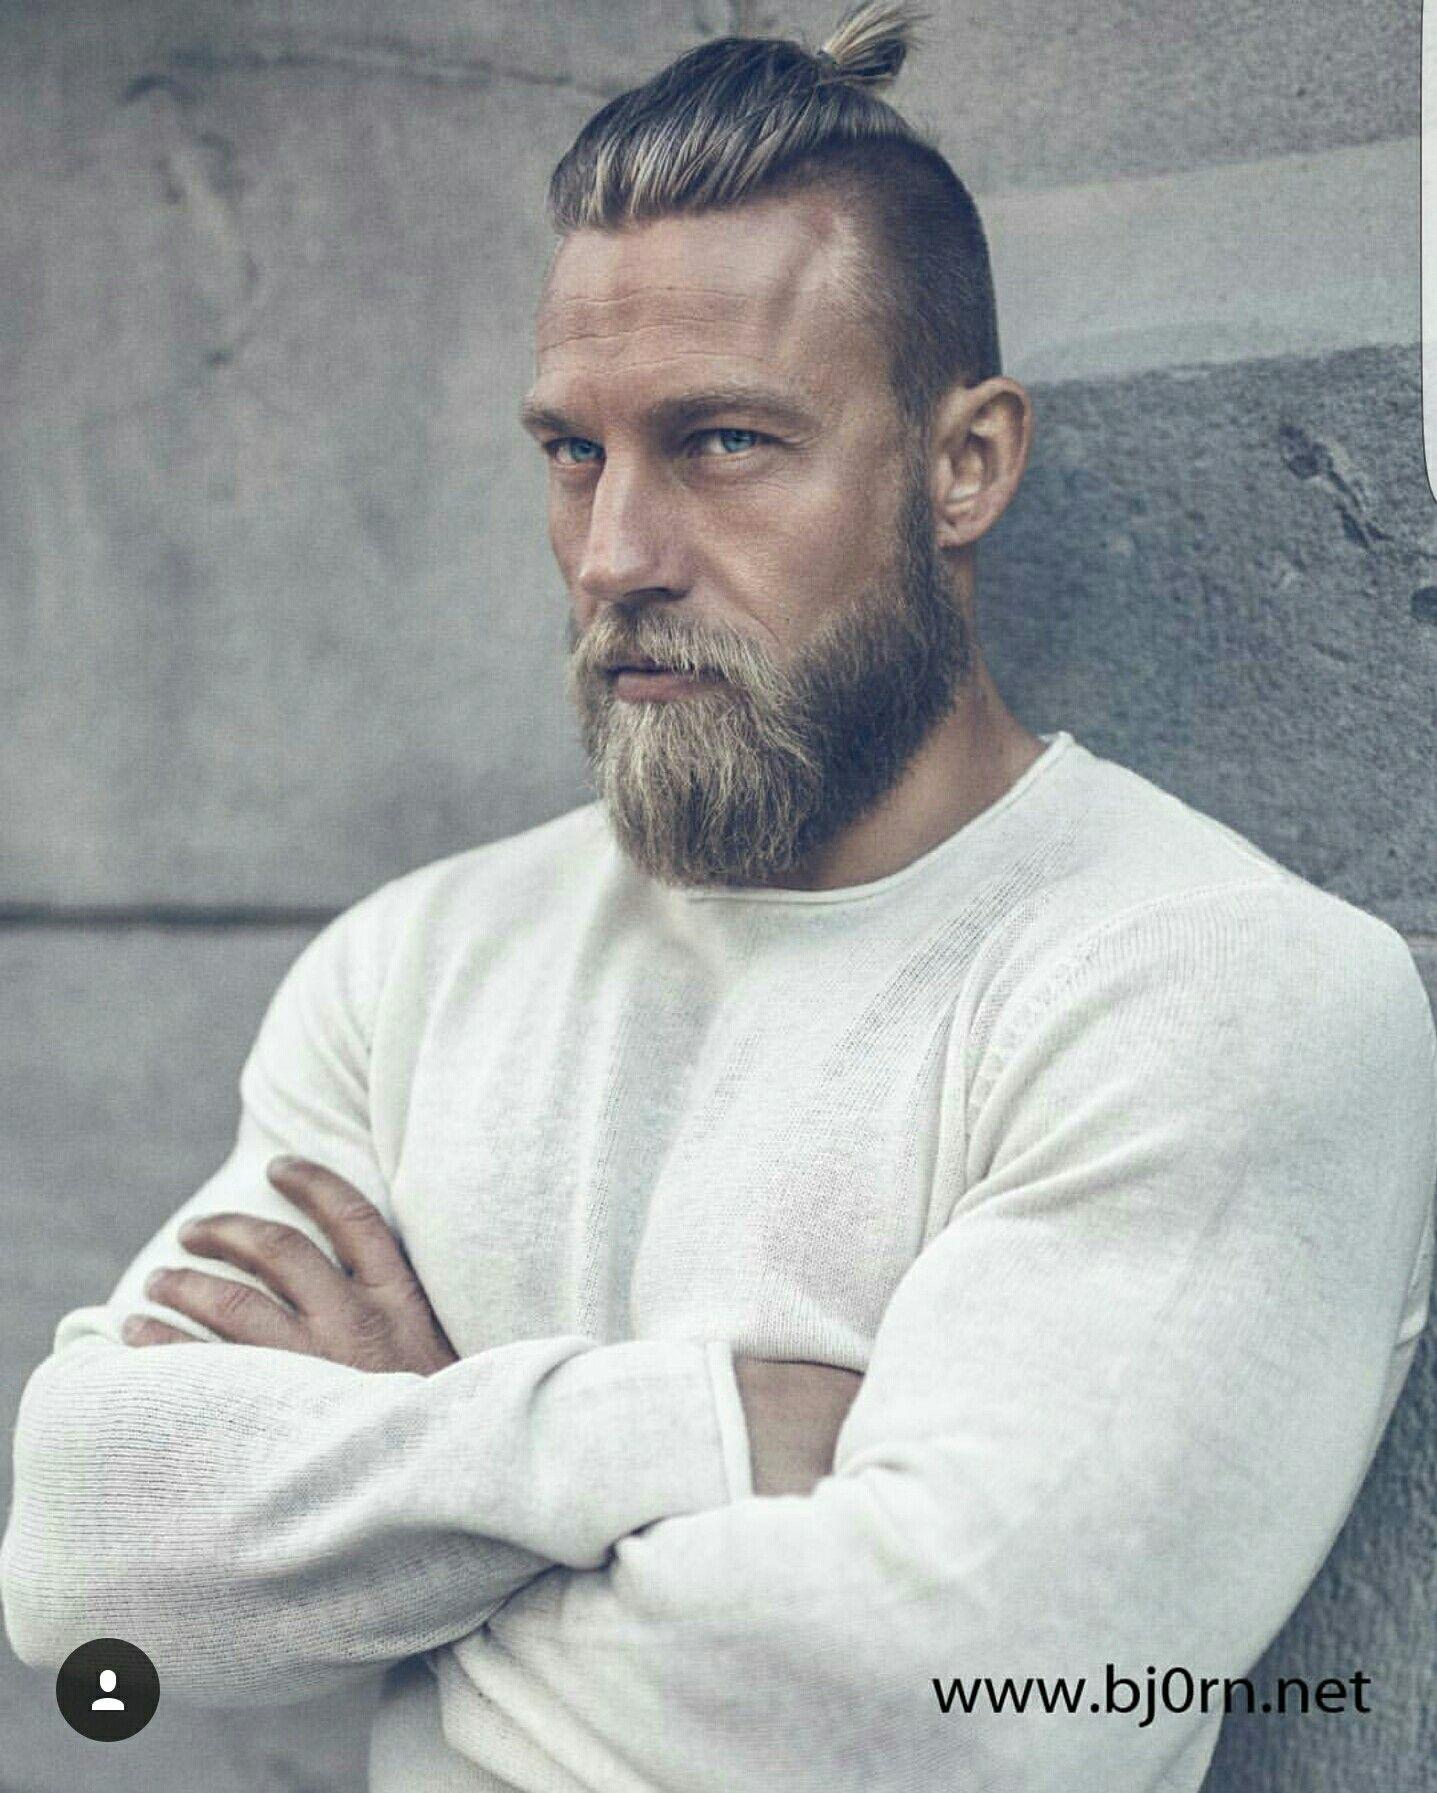 Stian Bjornes Baard Stijl Baard Man Herenkapsel